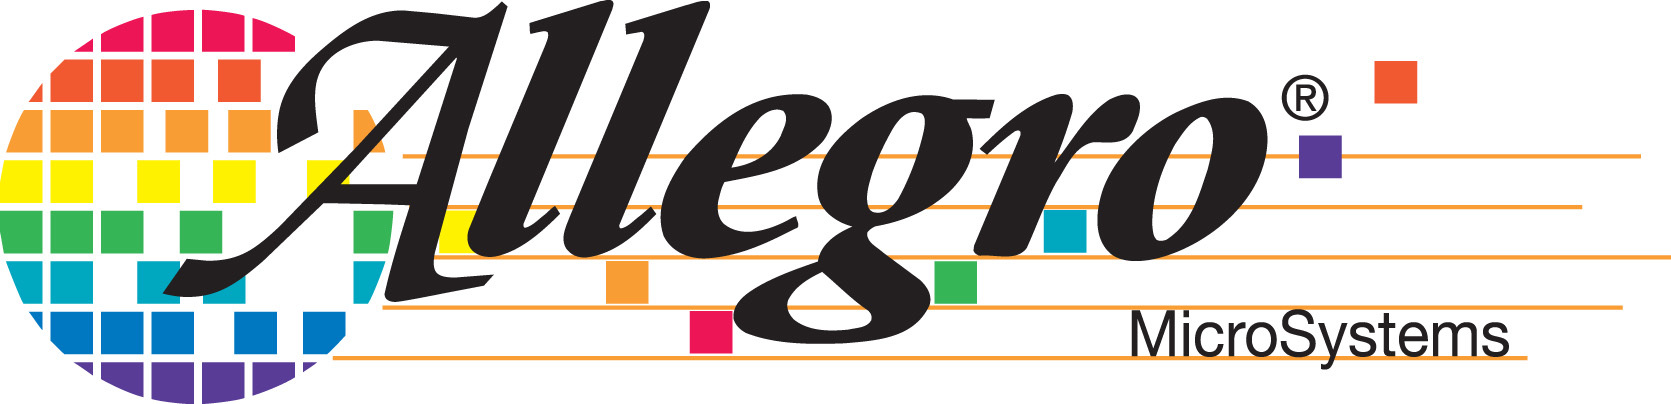 Allegro MicroSystems, LLC